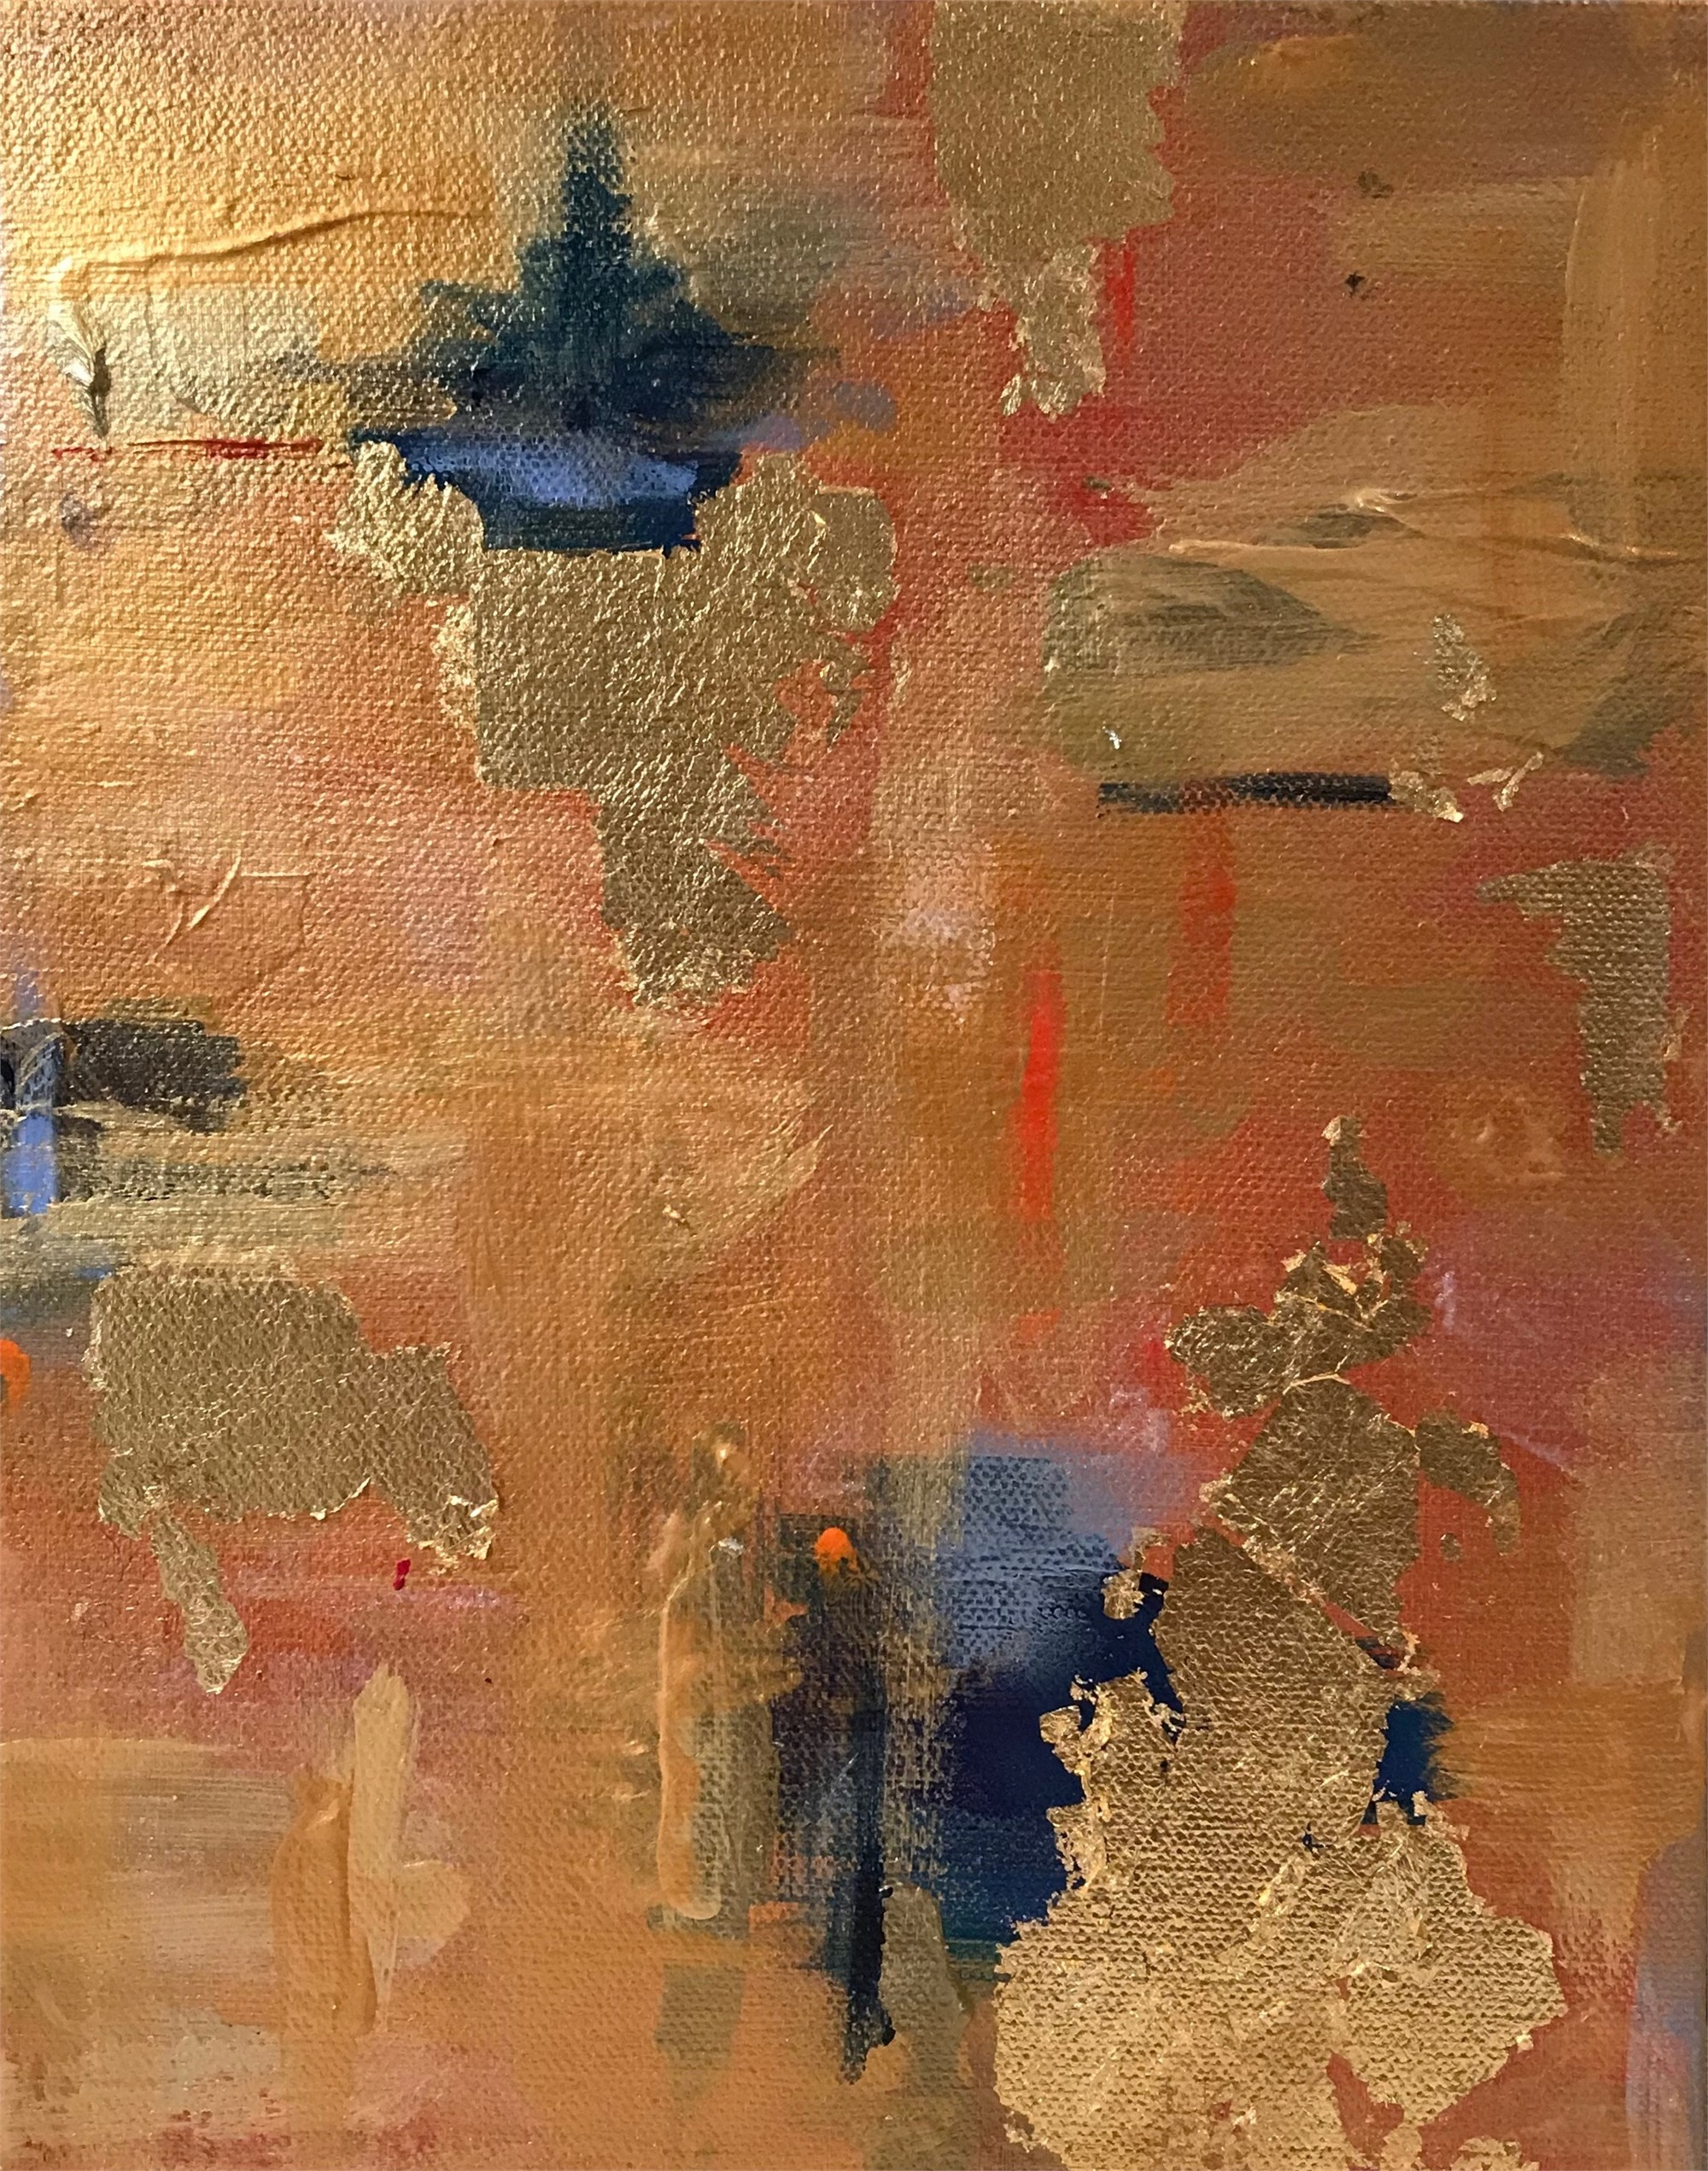 Beauty No. 19 by Leslie Poteet Busker